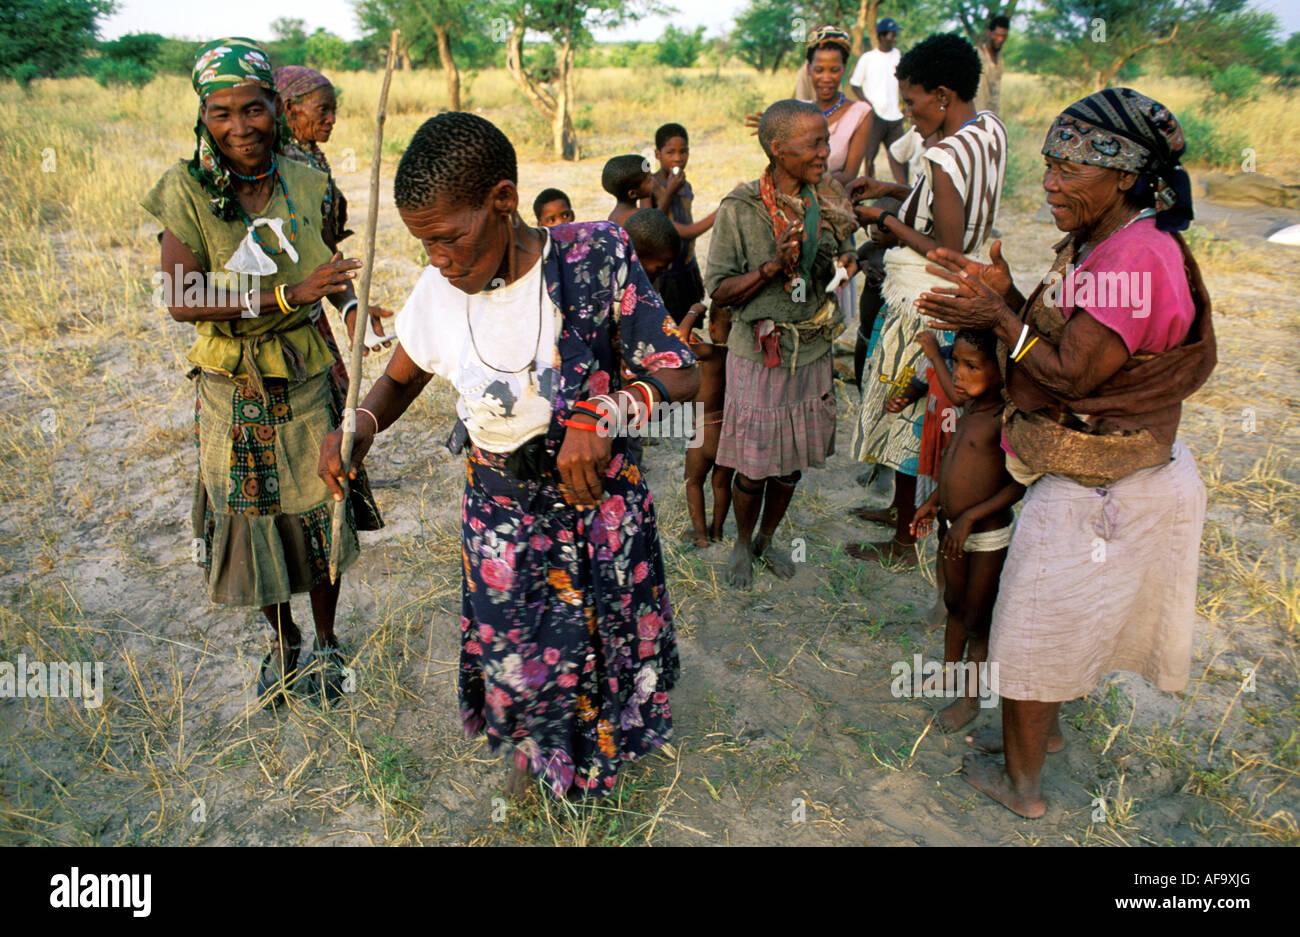 Kua bushman women dancing Molapo, Central Kalahari Game Reserve; Botswana - Stock Image